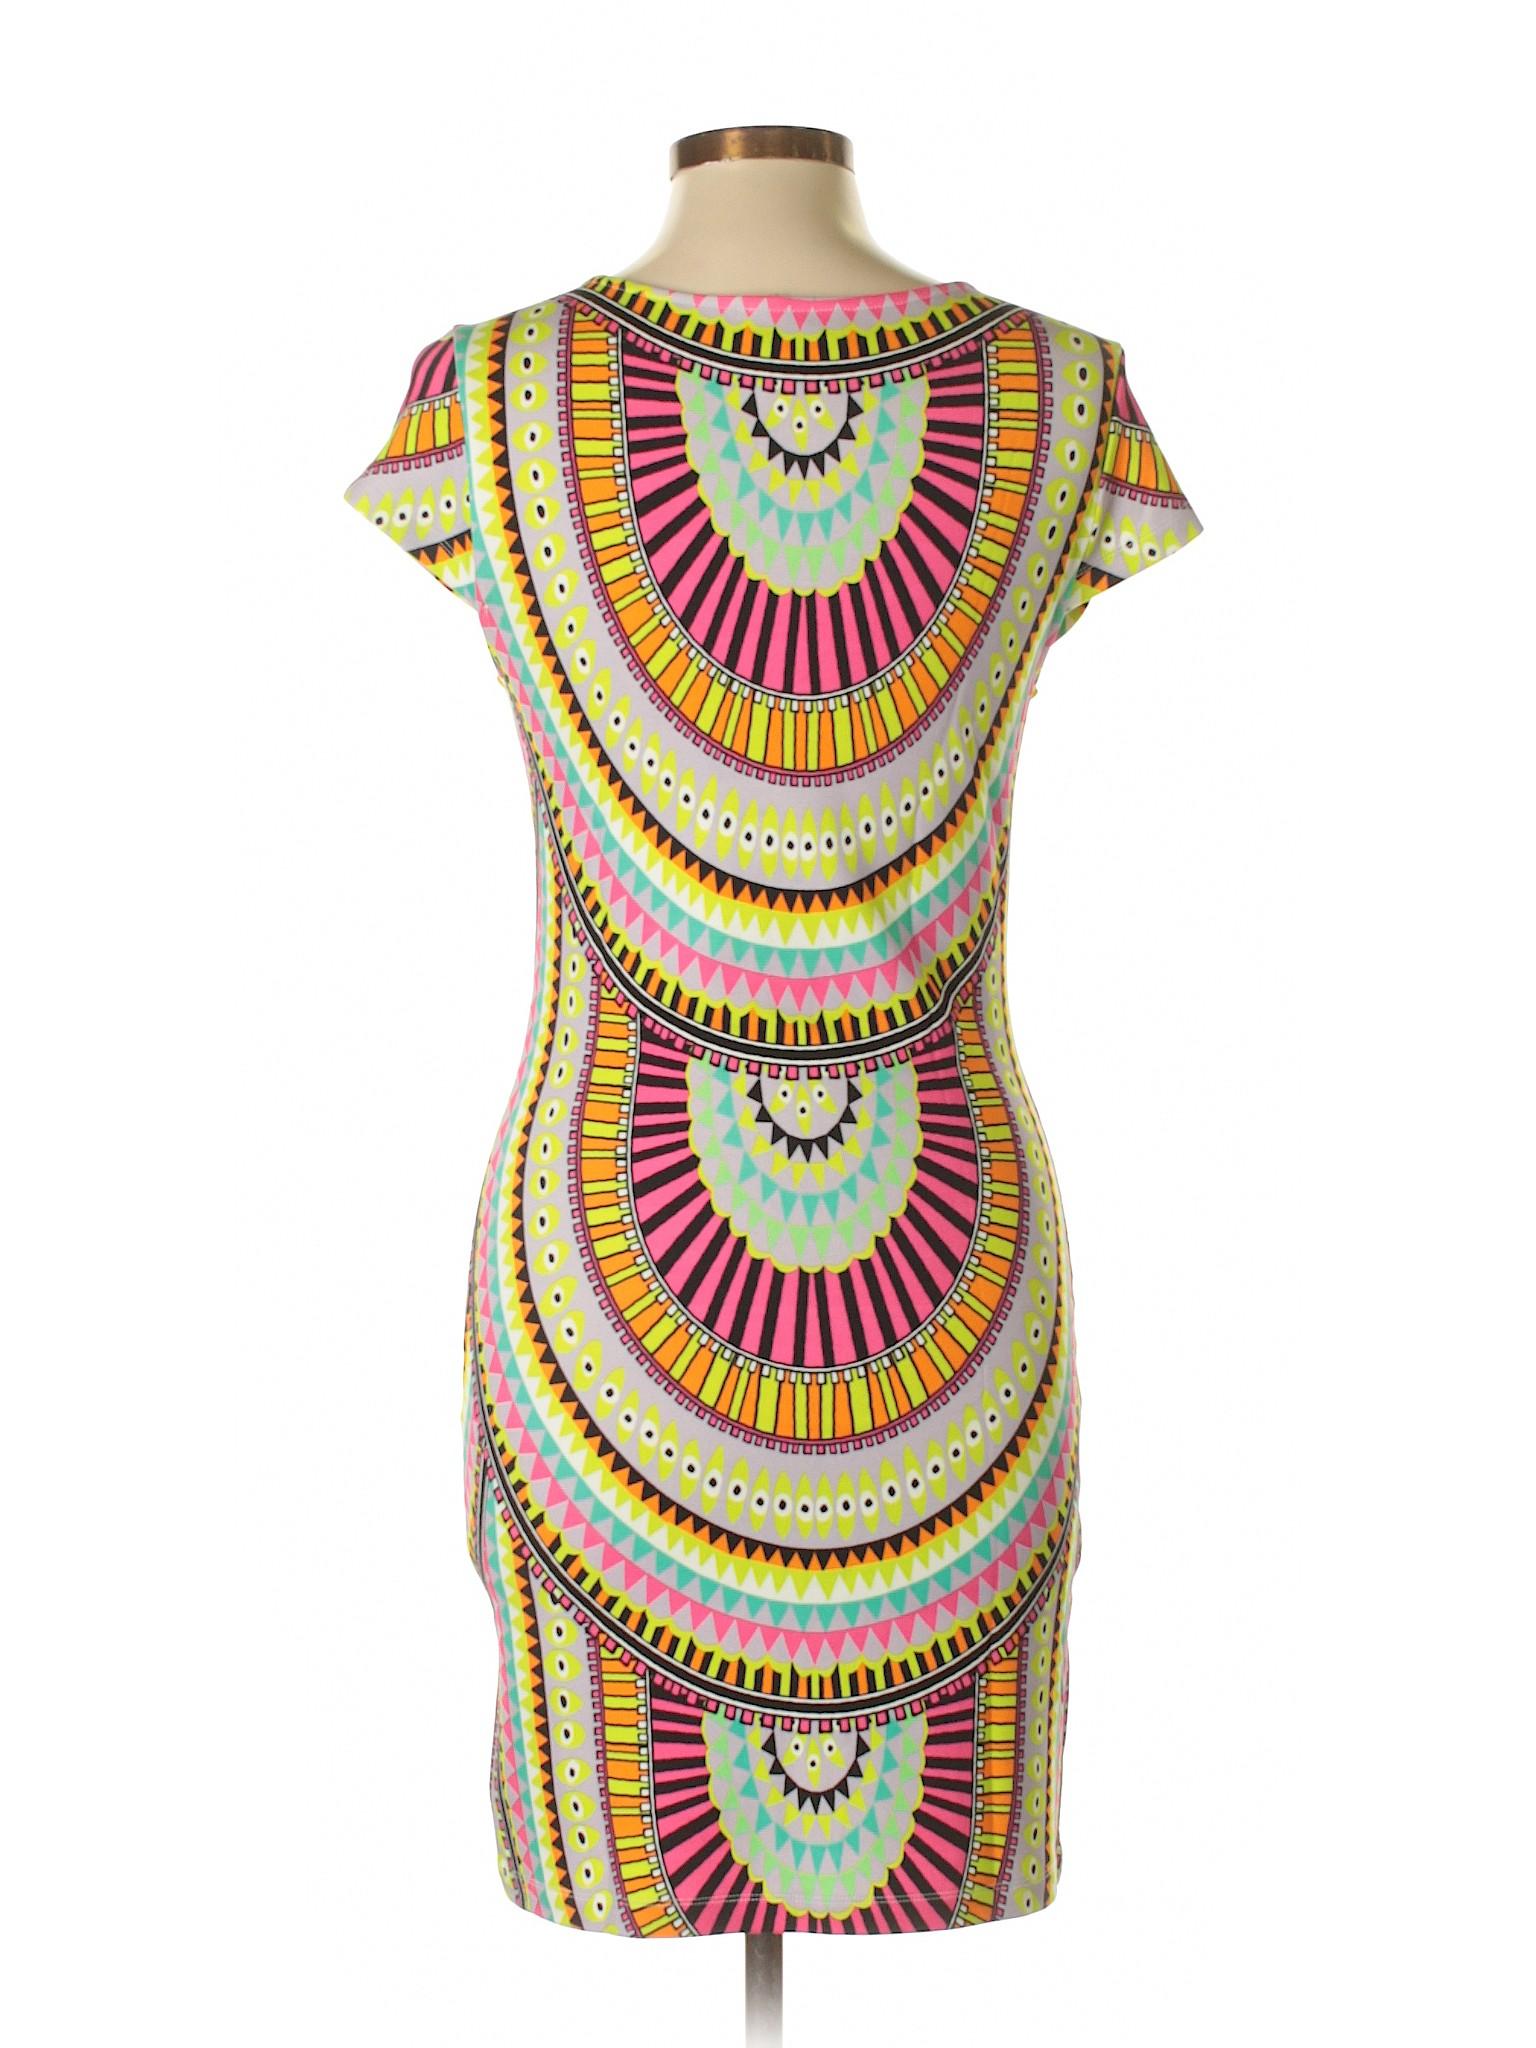 Hoffman Mara Hoffman Casual Mara Dress Selling Selling wIxqB4vz